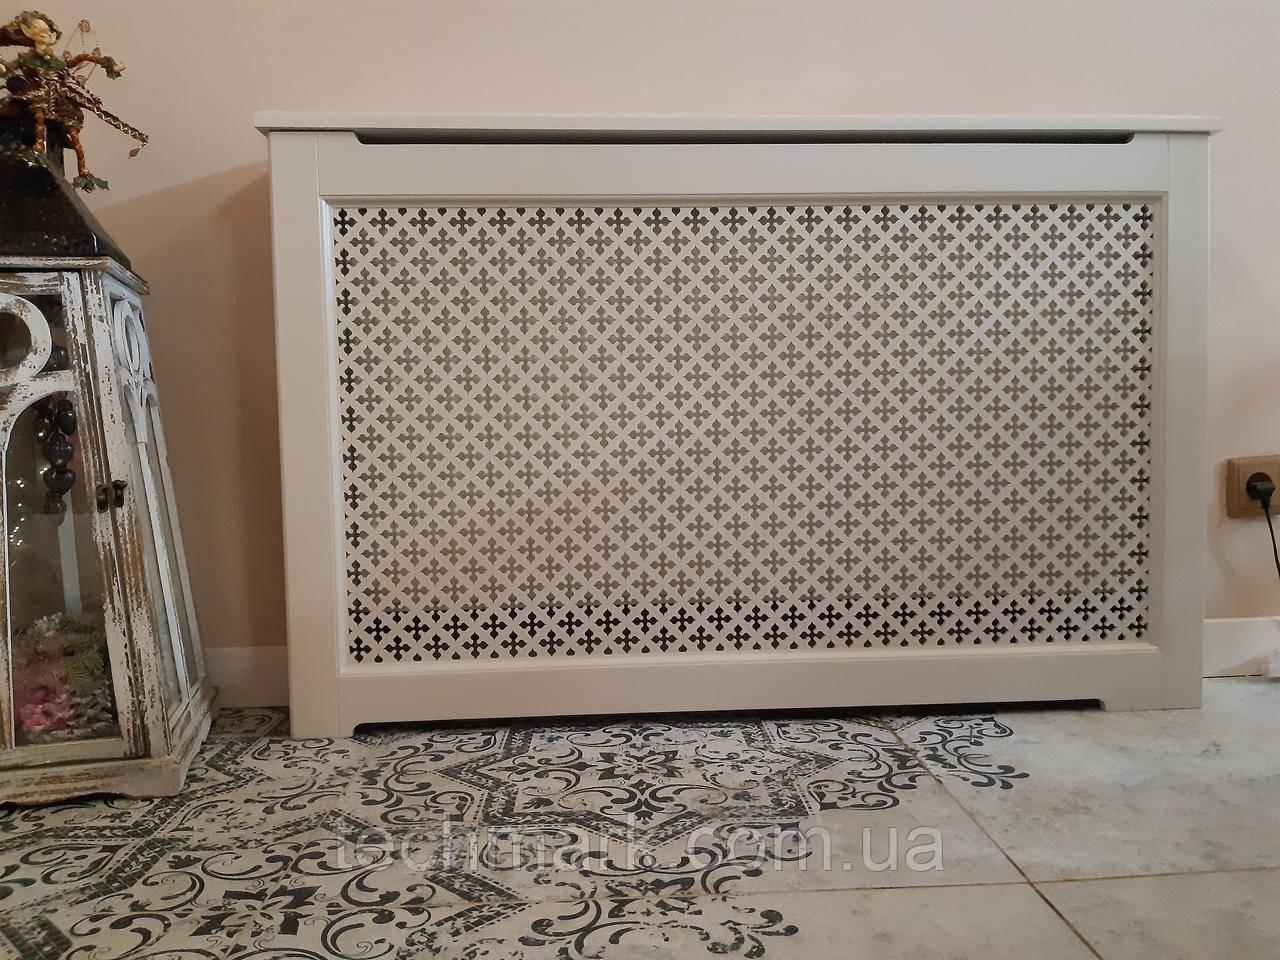 Декоративная решетка экран (короб) на батарею отопления R104-K